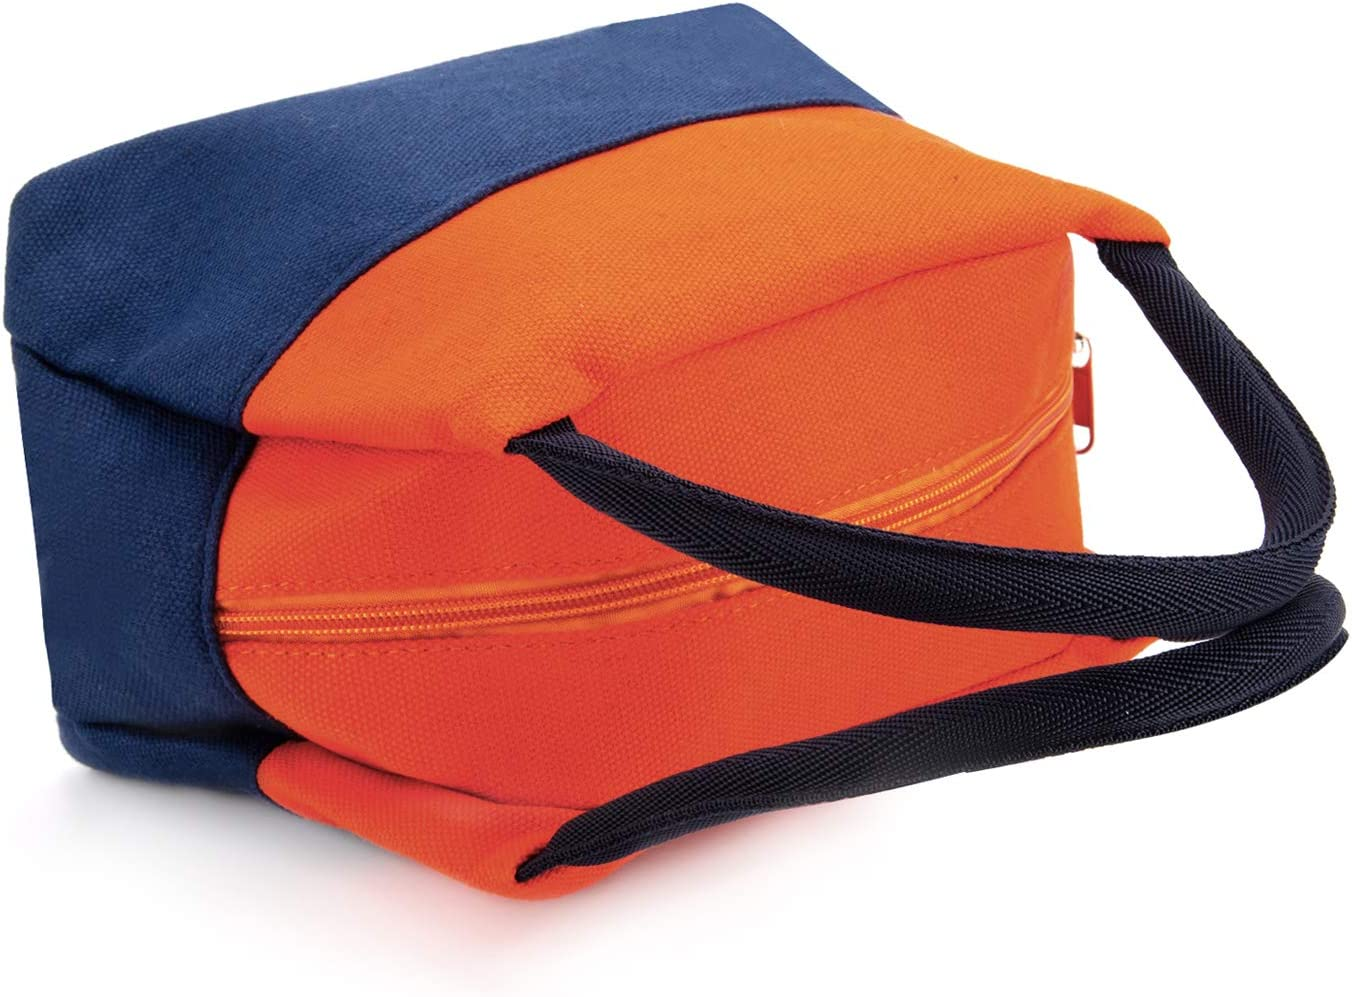 Ulela Lunch Bag Tote Bag for Women Wide Open Cooler Bag Thermal Leak-Proof Lunch Organizer For Men Girls Children Outdoor Picnic Work Contrast Color(orange and blue)